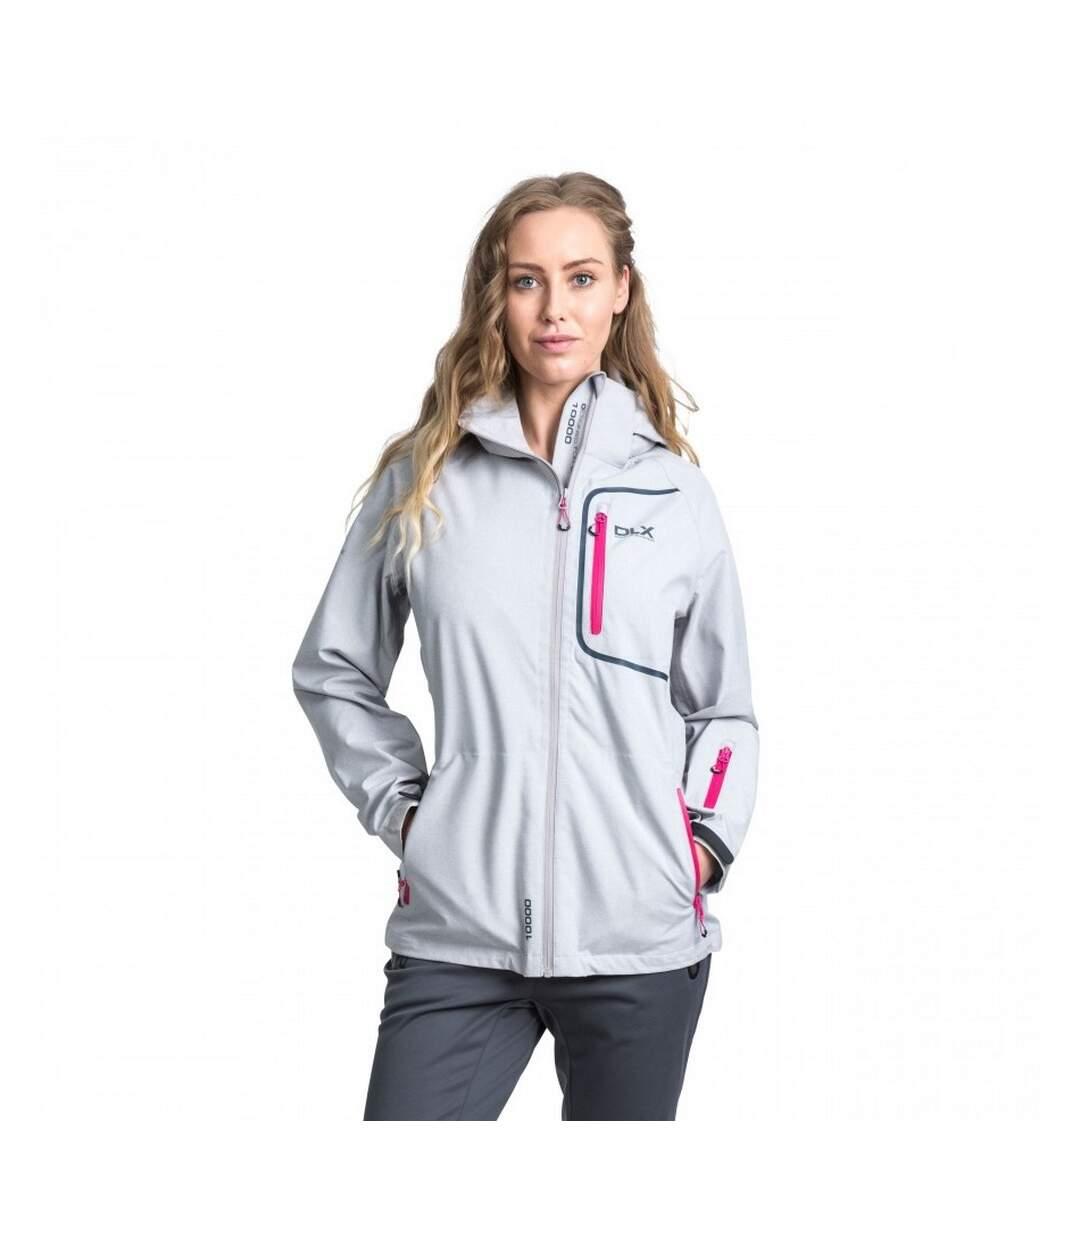 Trespass Womens/Ladies Gita II Waterproof Shell Jacket (Quartz Marl) - UTTP4131